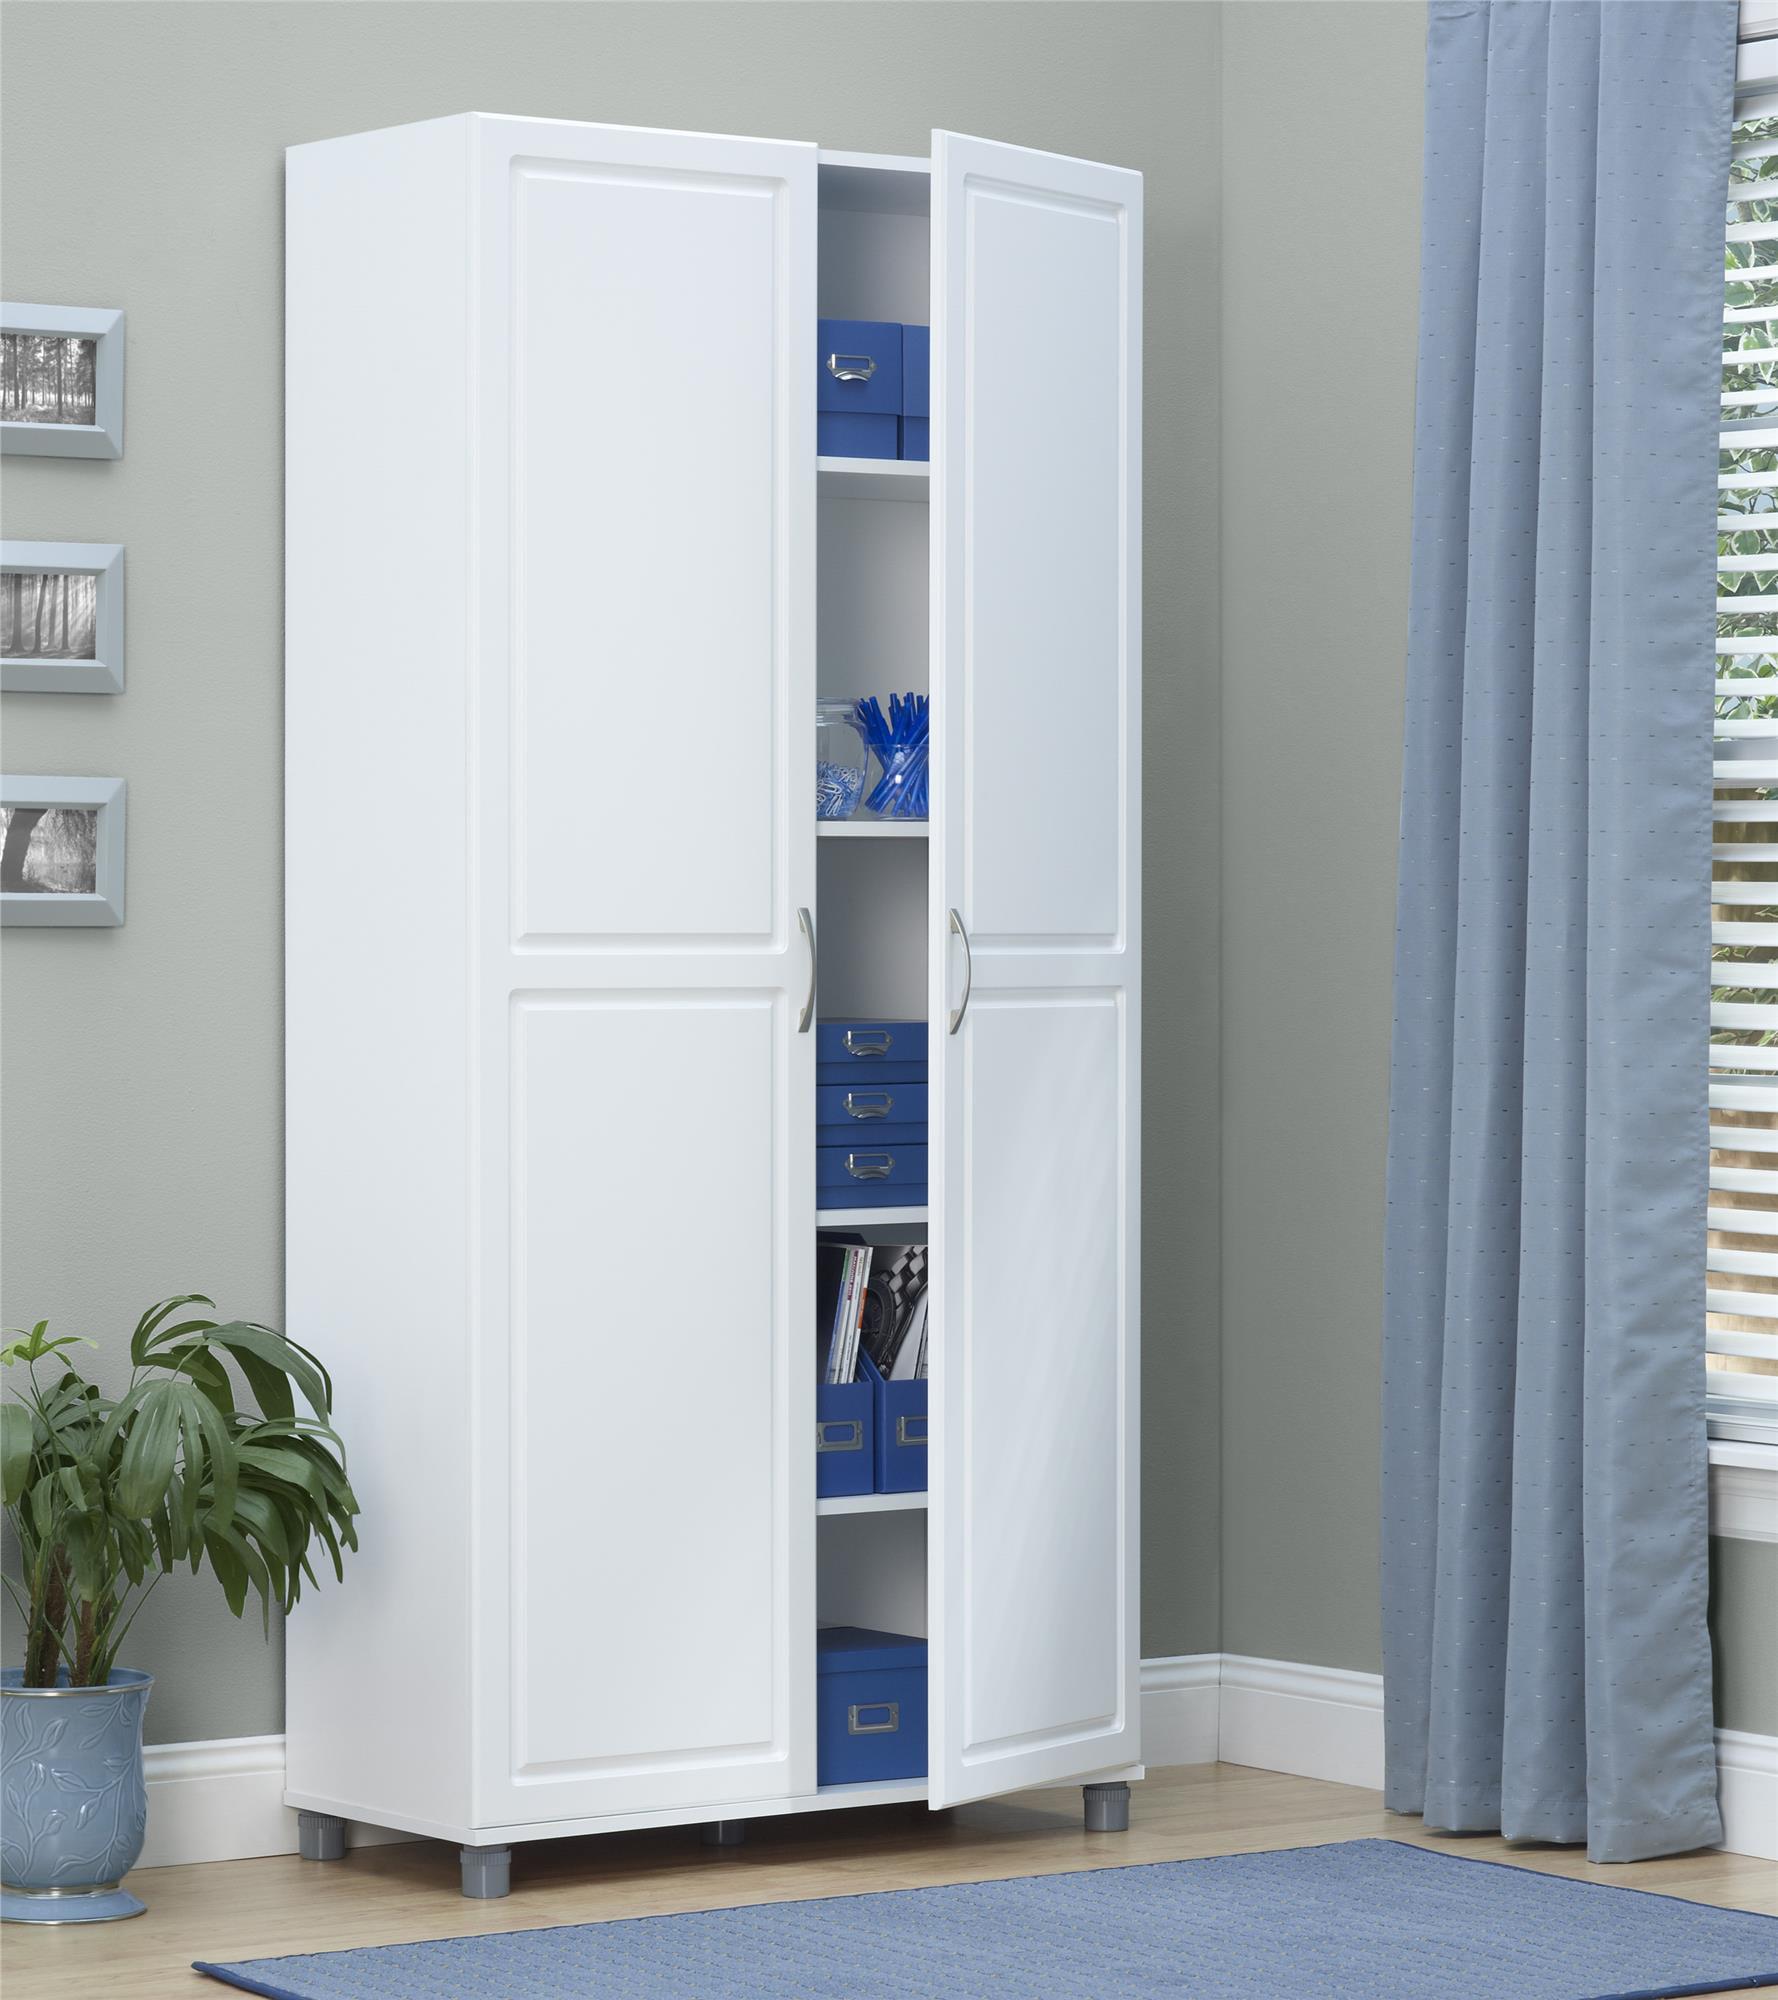 Systembuild 35 7 W X 15 4 D X 74 3 H Utility Storage Cabinet White Walmart Com Walmart Com